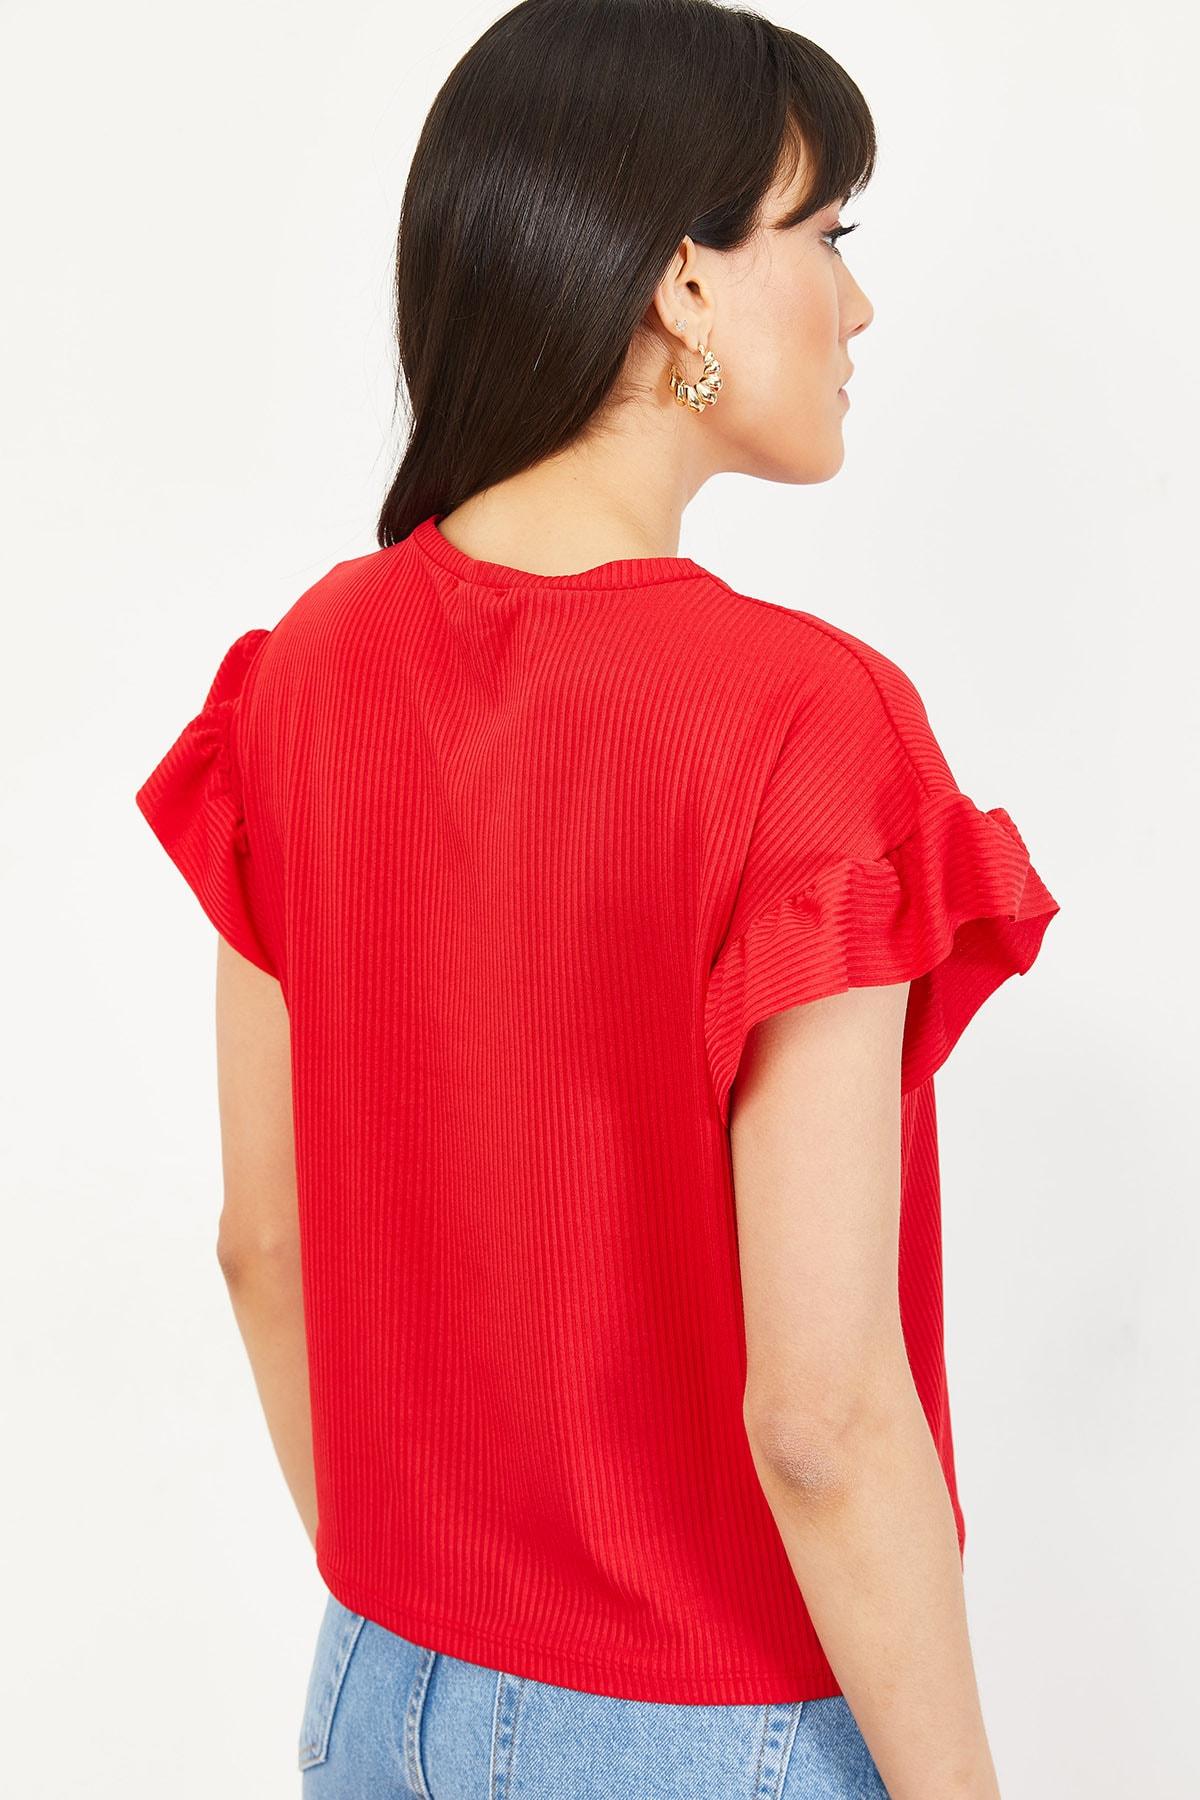 Bianco Lucci Kadın Kırmızı Kolu Fırfırlı Kaşkorse Bluz 10051015 2